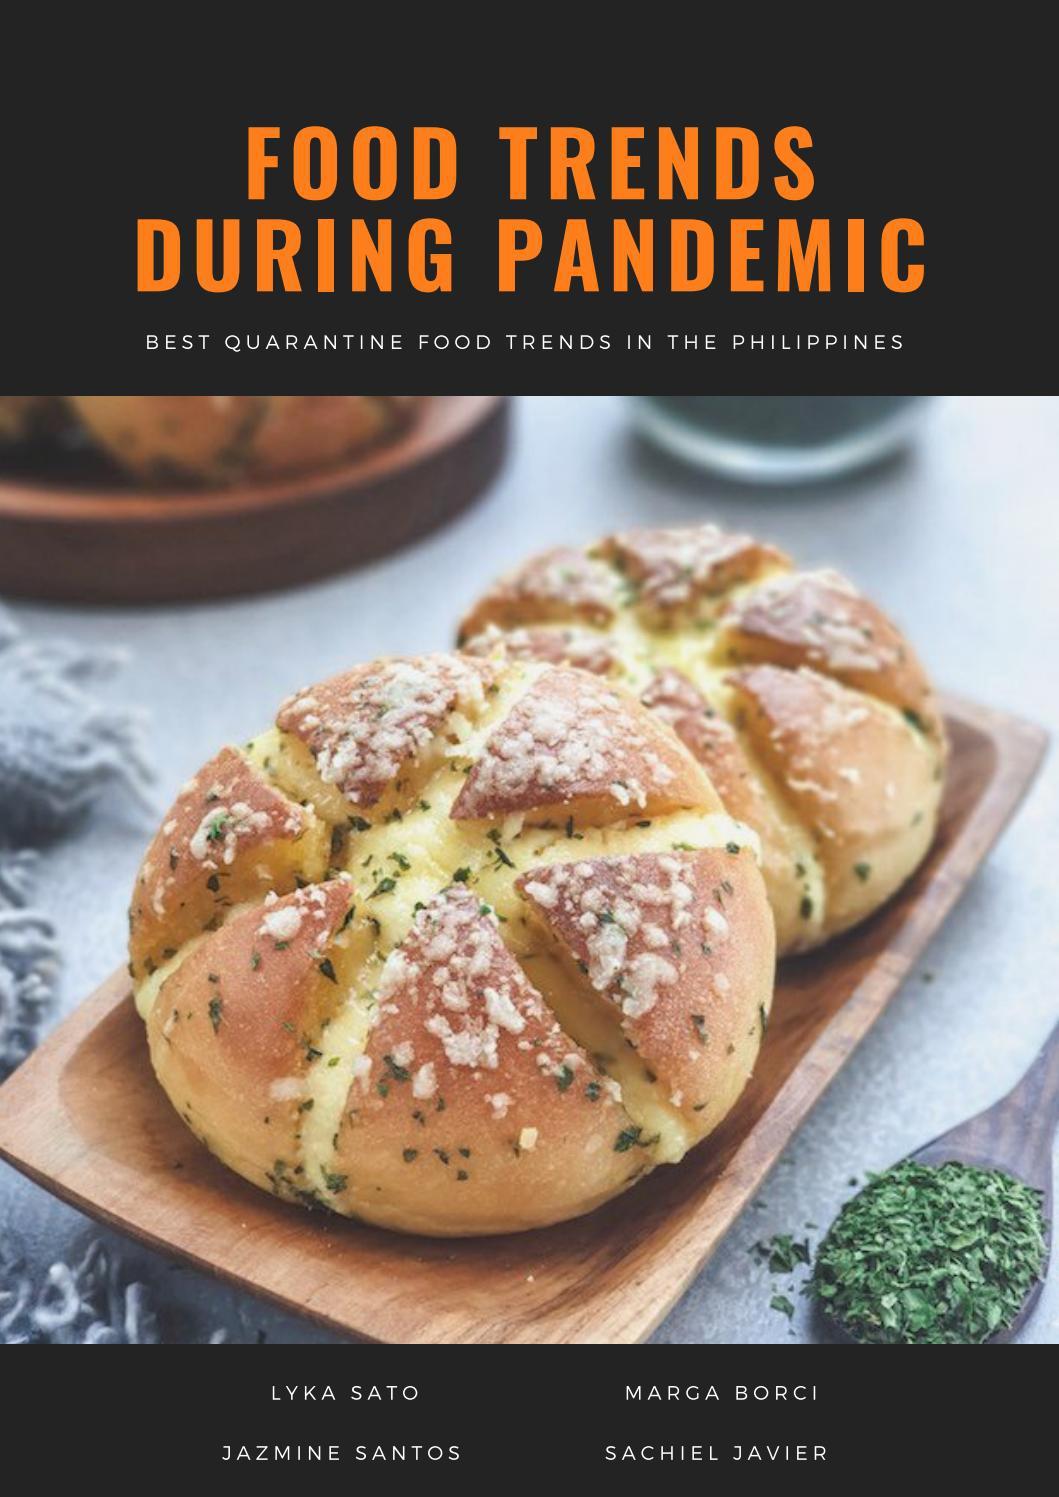 Pandemic Food Trends Magazine